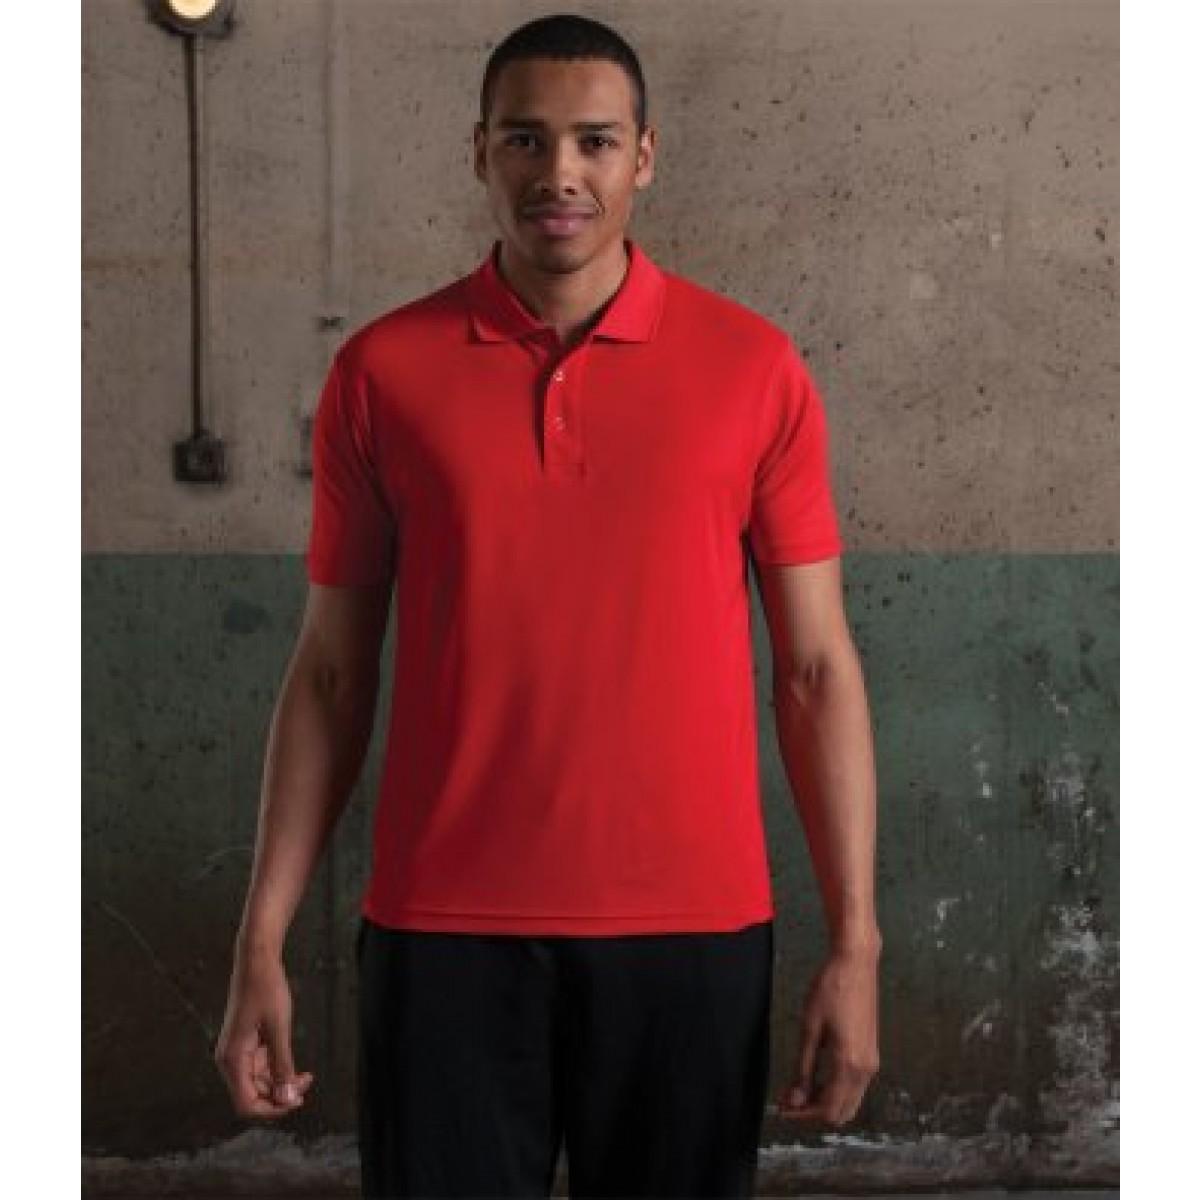 b7b5997d AWDis Custom Performance Polo Shirts for Embroidery